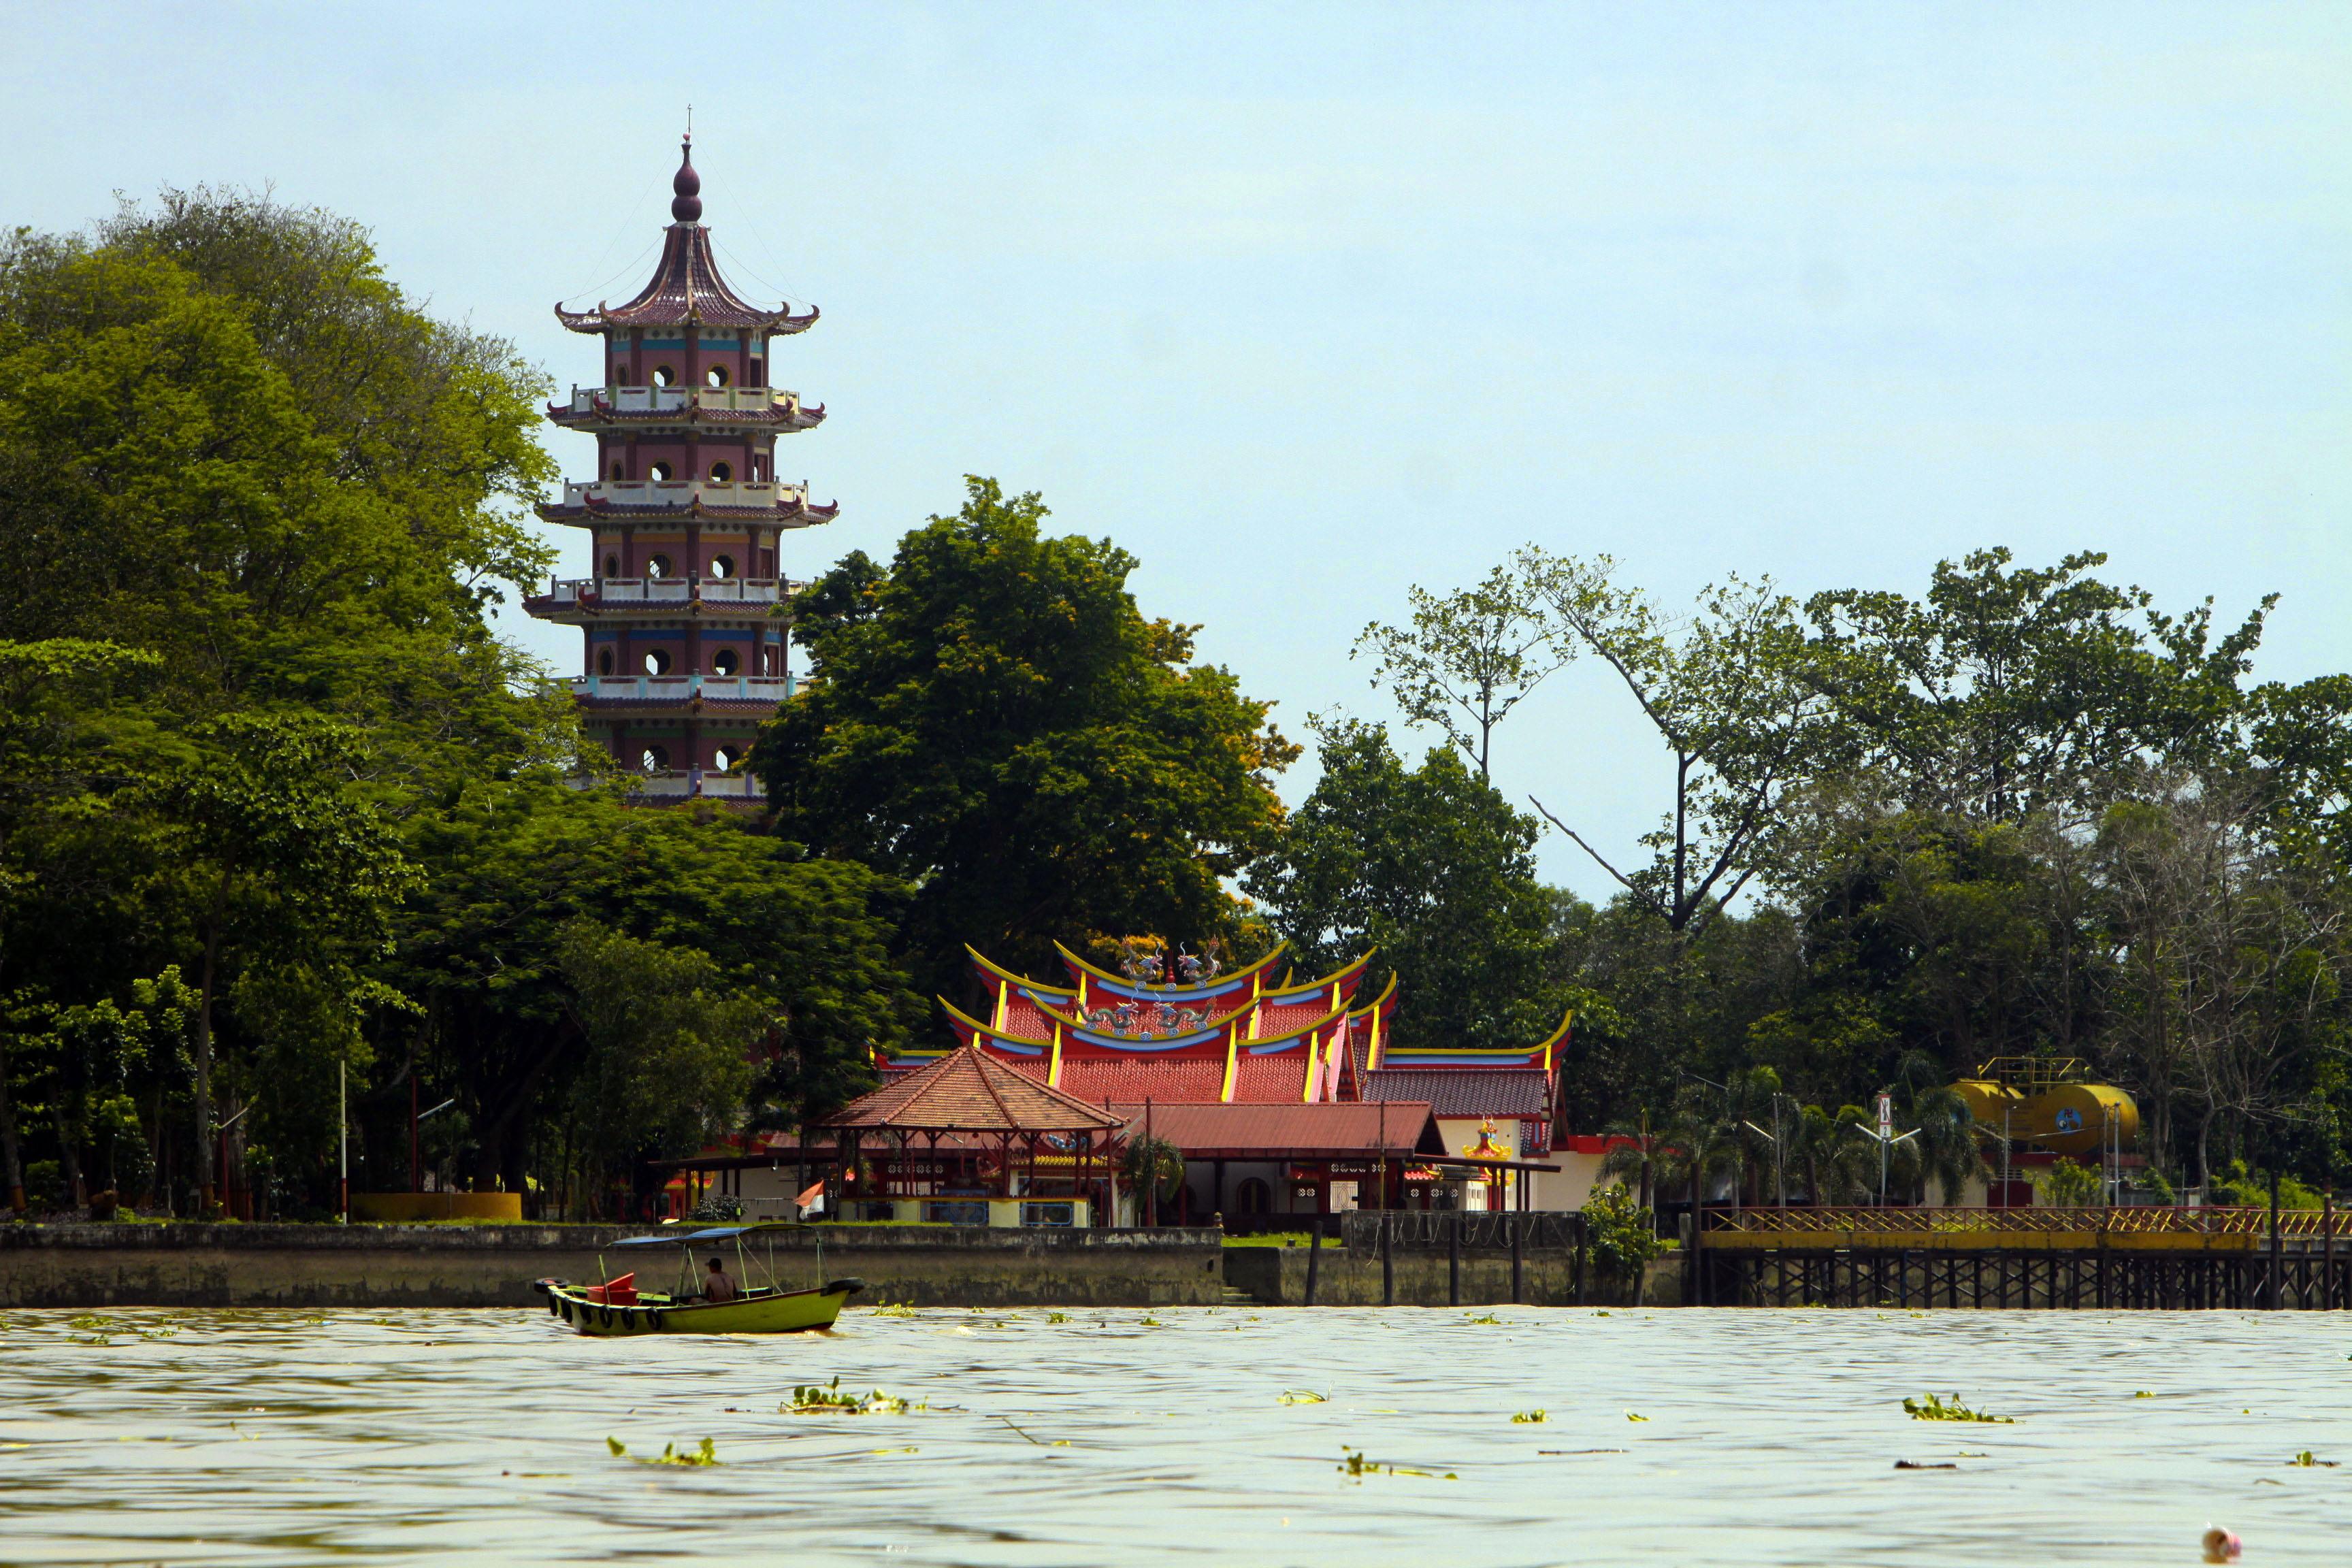 Wisata Palembang Kreasi Alfajri Pulau Kemaro Fantasy Kota